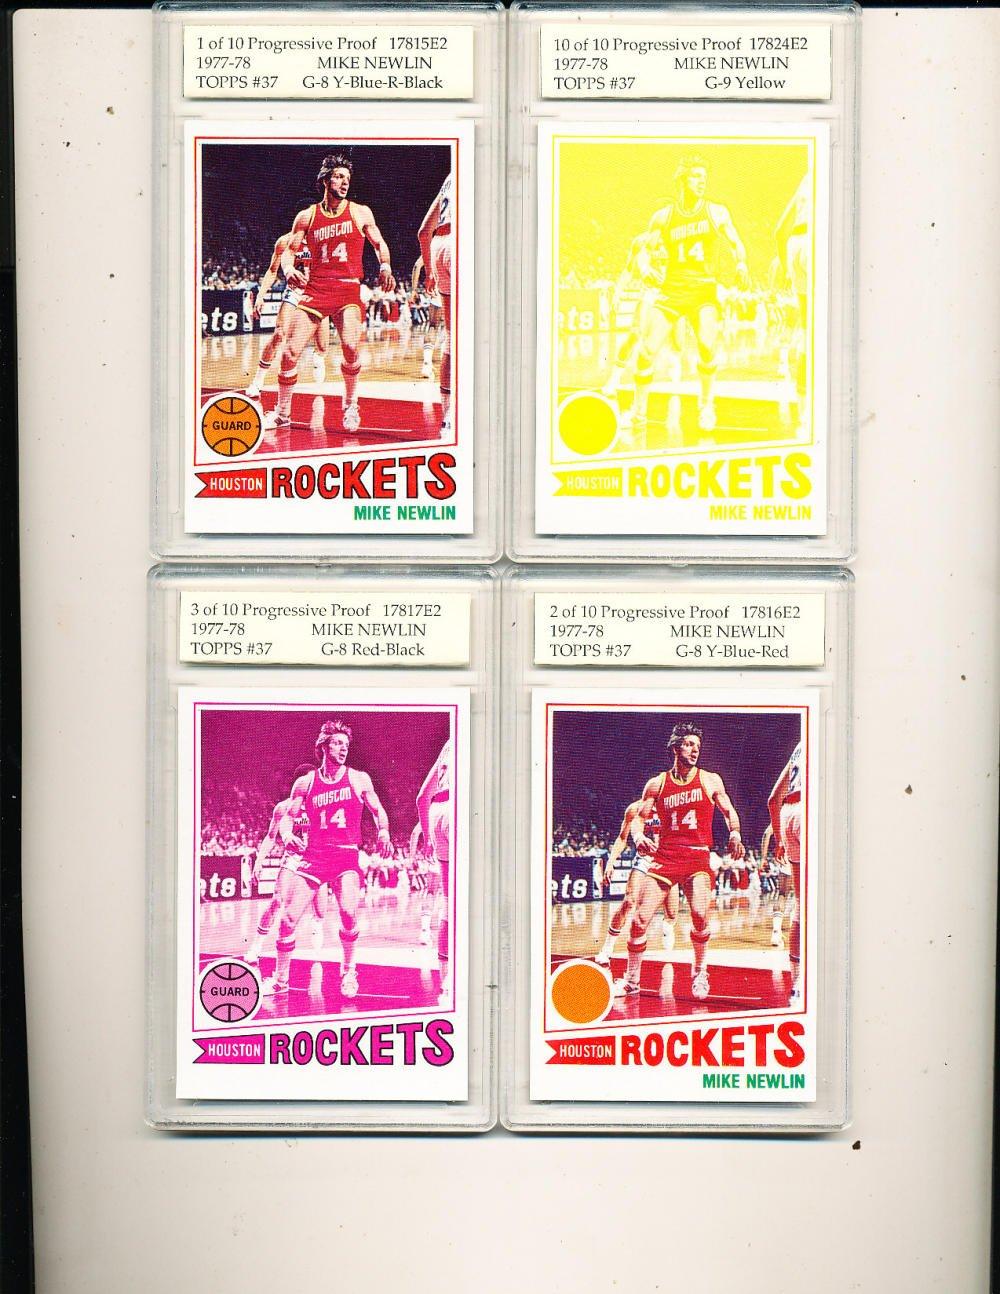 1977 topps basketball card Mike Newlin Houston Rockets 10